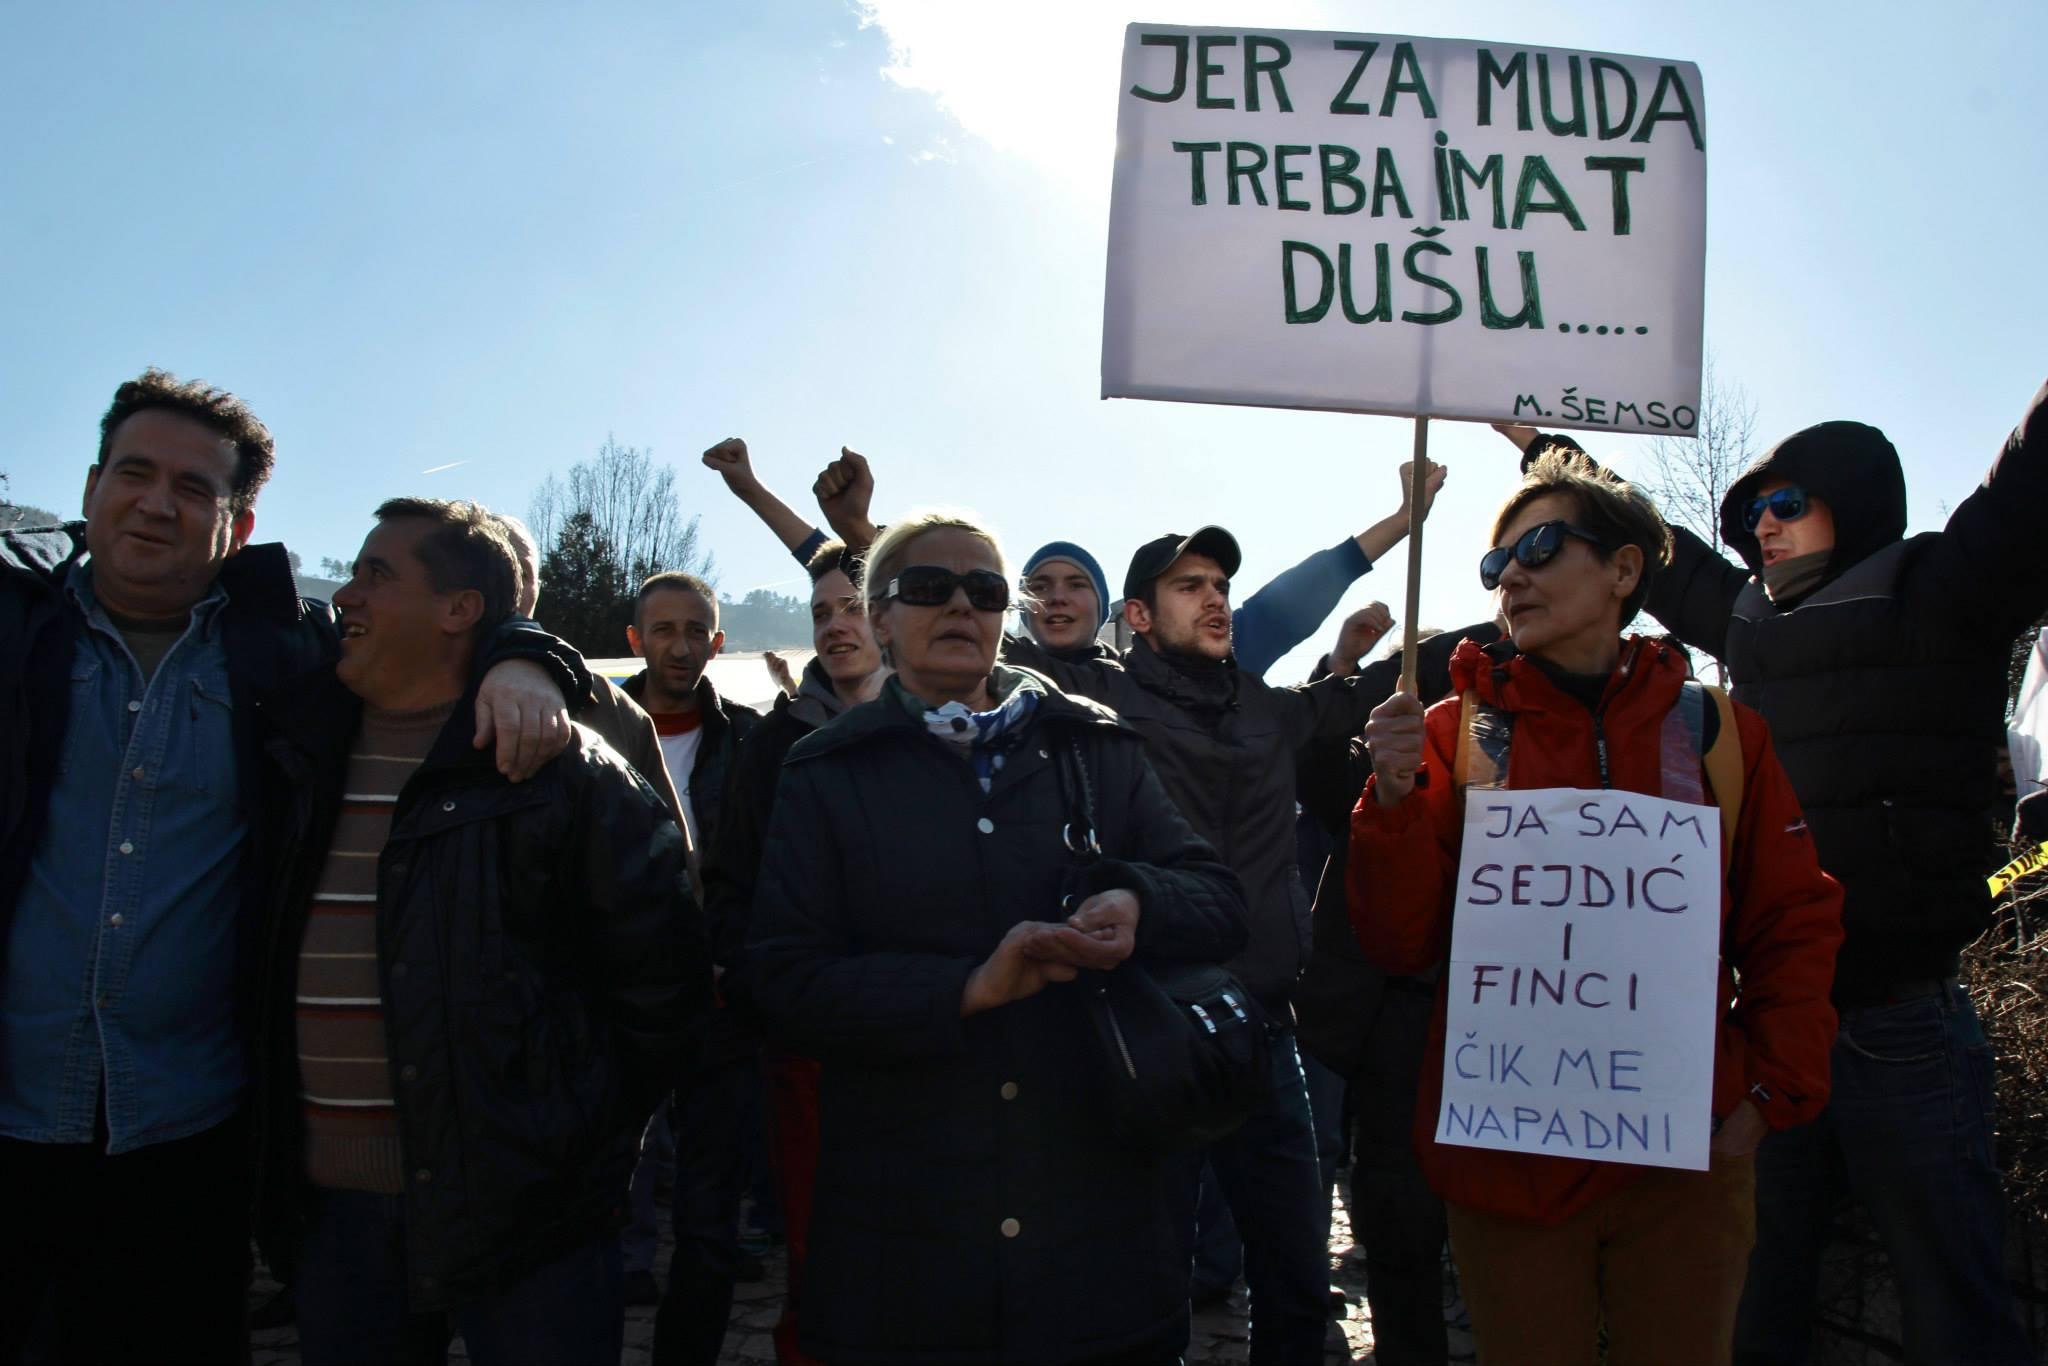 http://www.donaustroom.eu/wp-content/uploads/2017/04/protest_muda.jpg